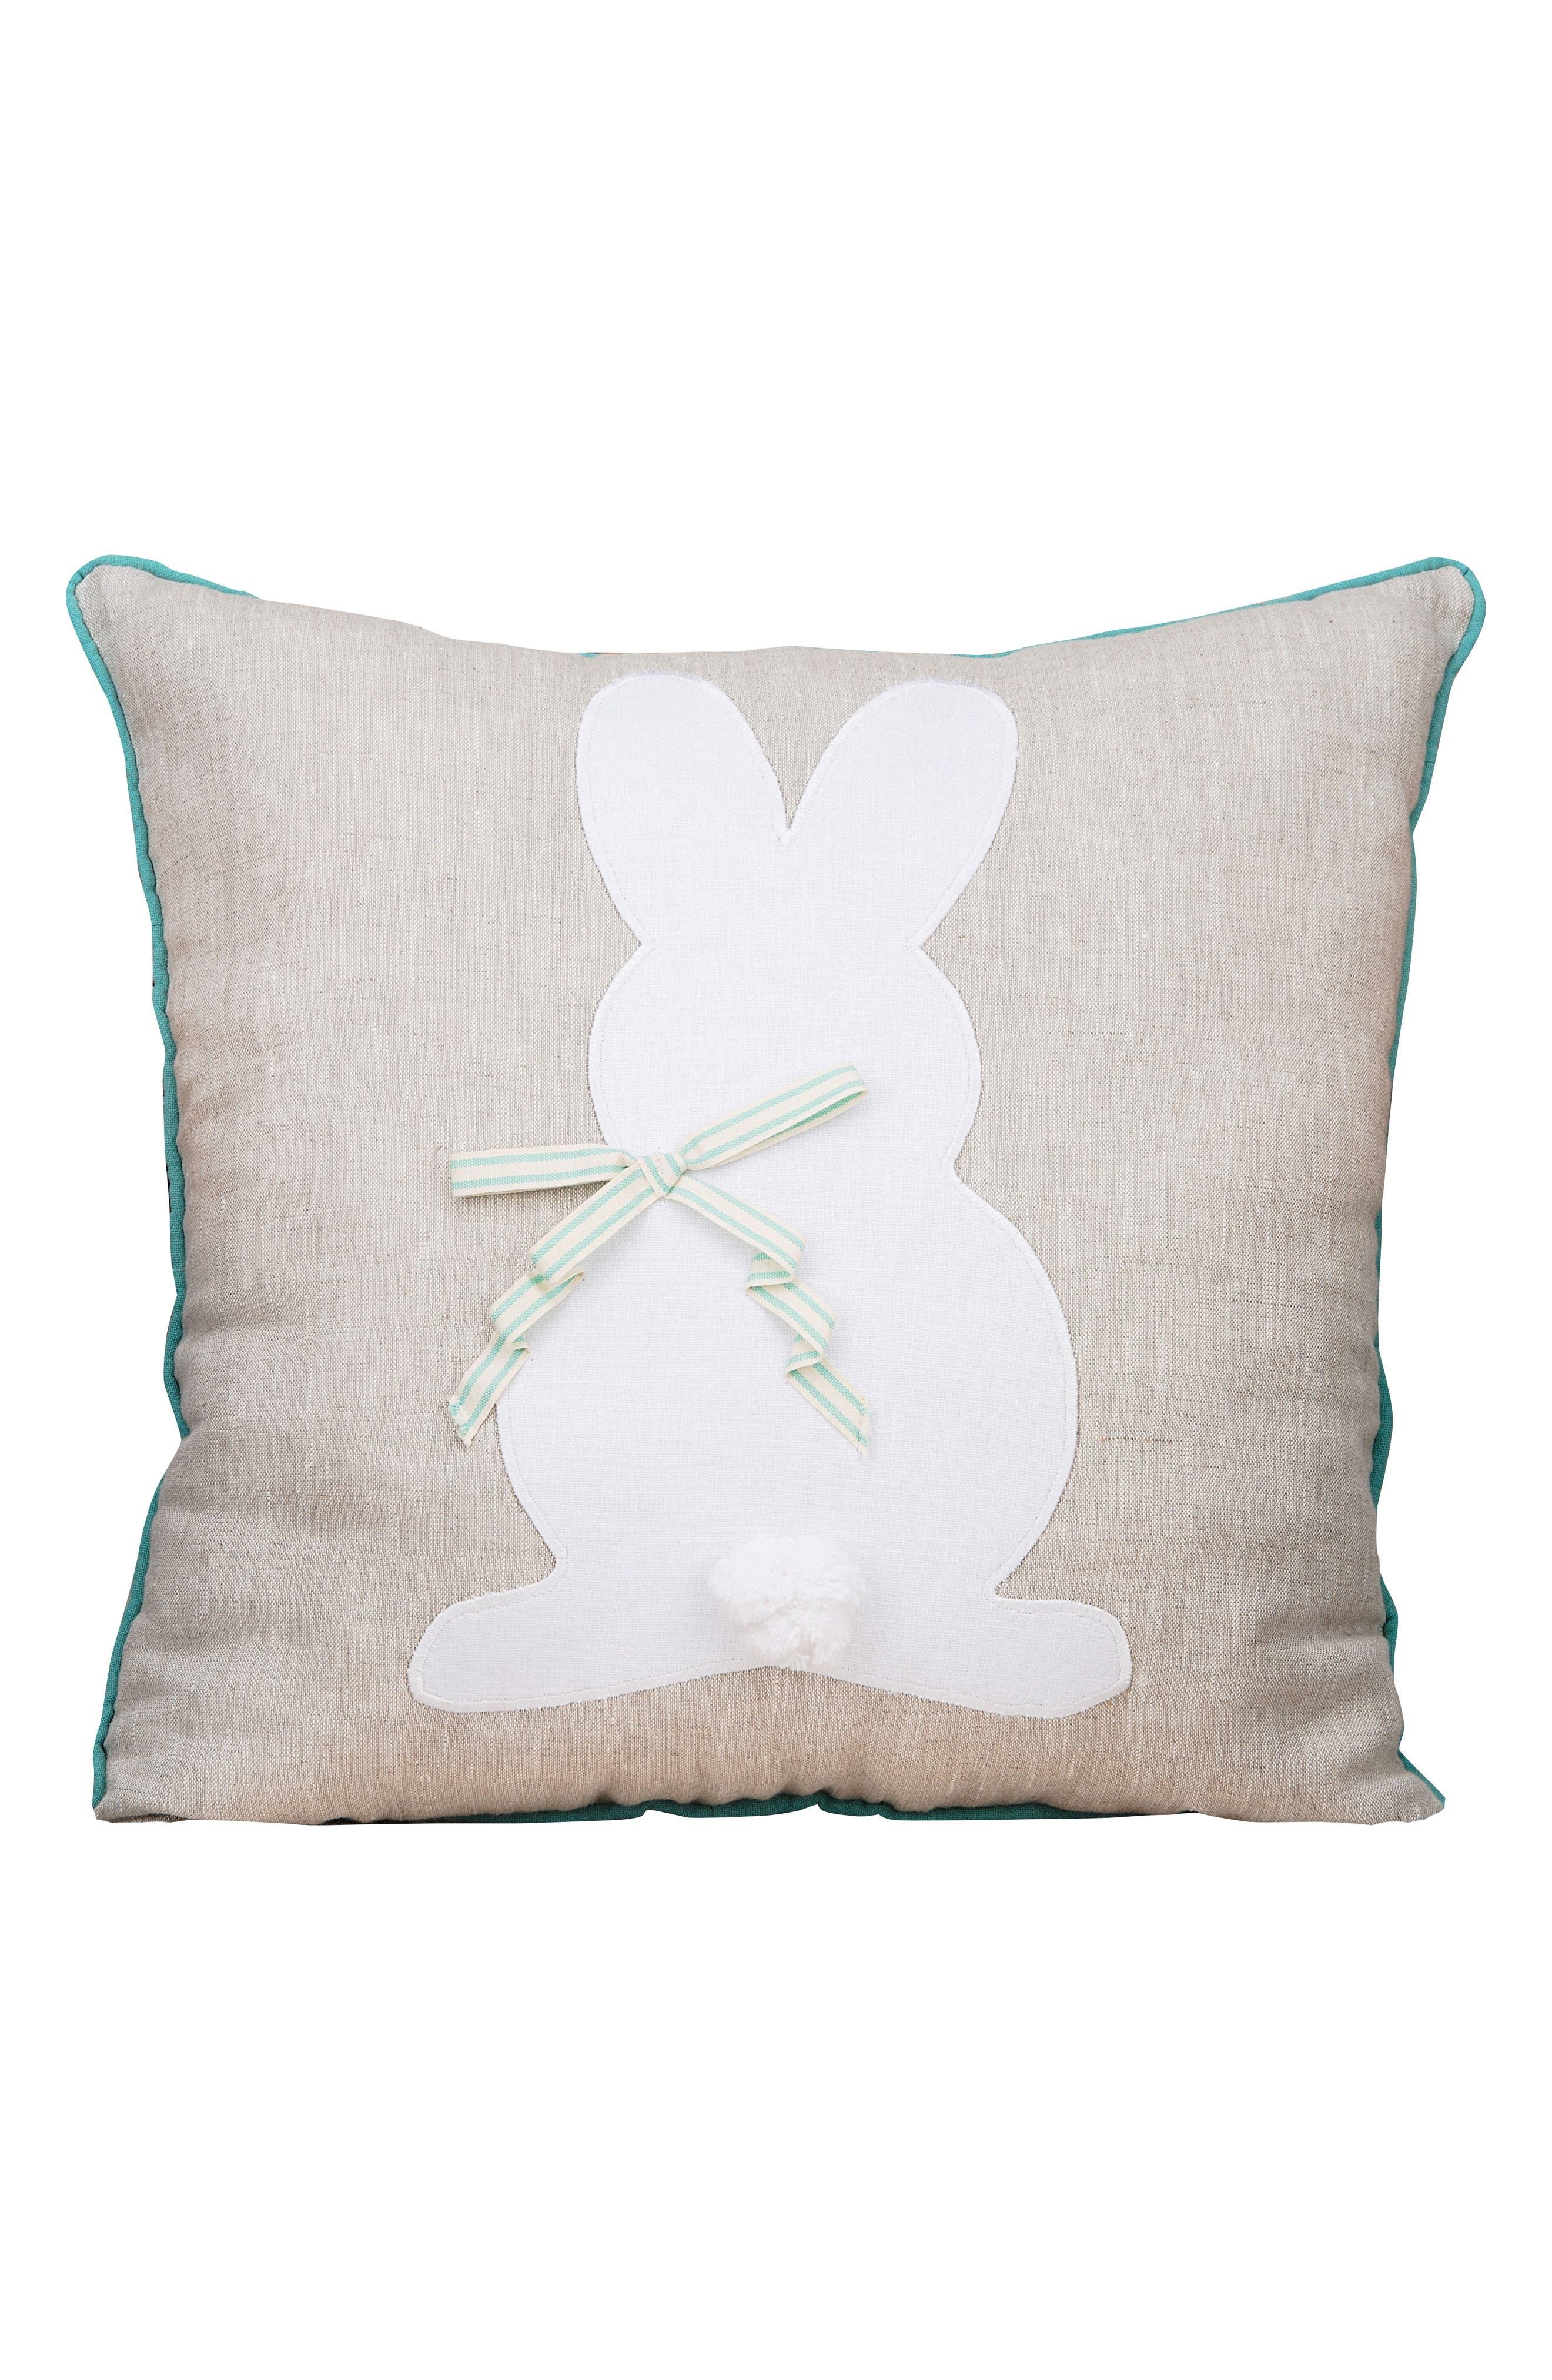 Glory Haux Bunny Pillow,                             Main thumbnail 1, color,                             250